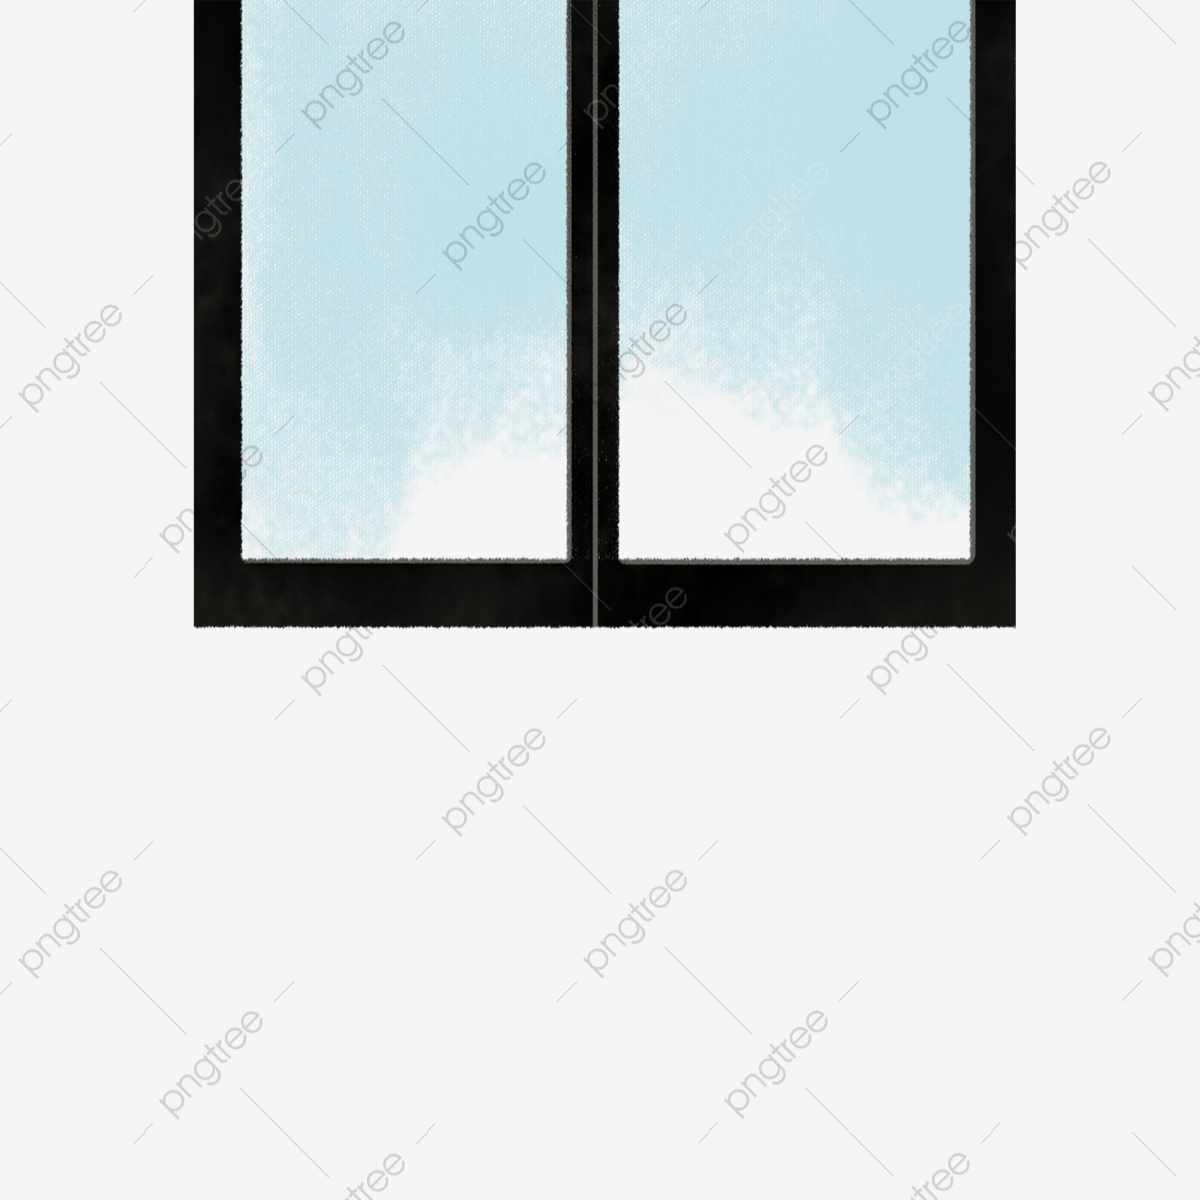 Gambar Tingkap Kaca Biru Hitam Kartun